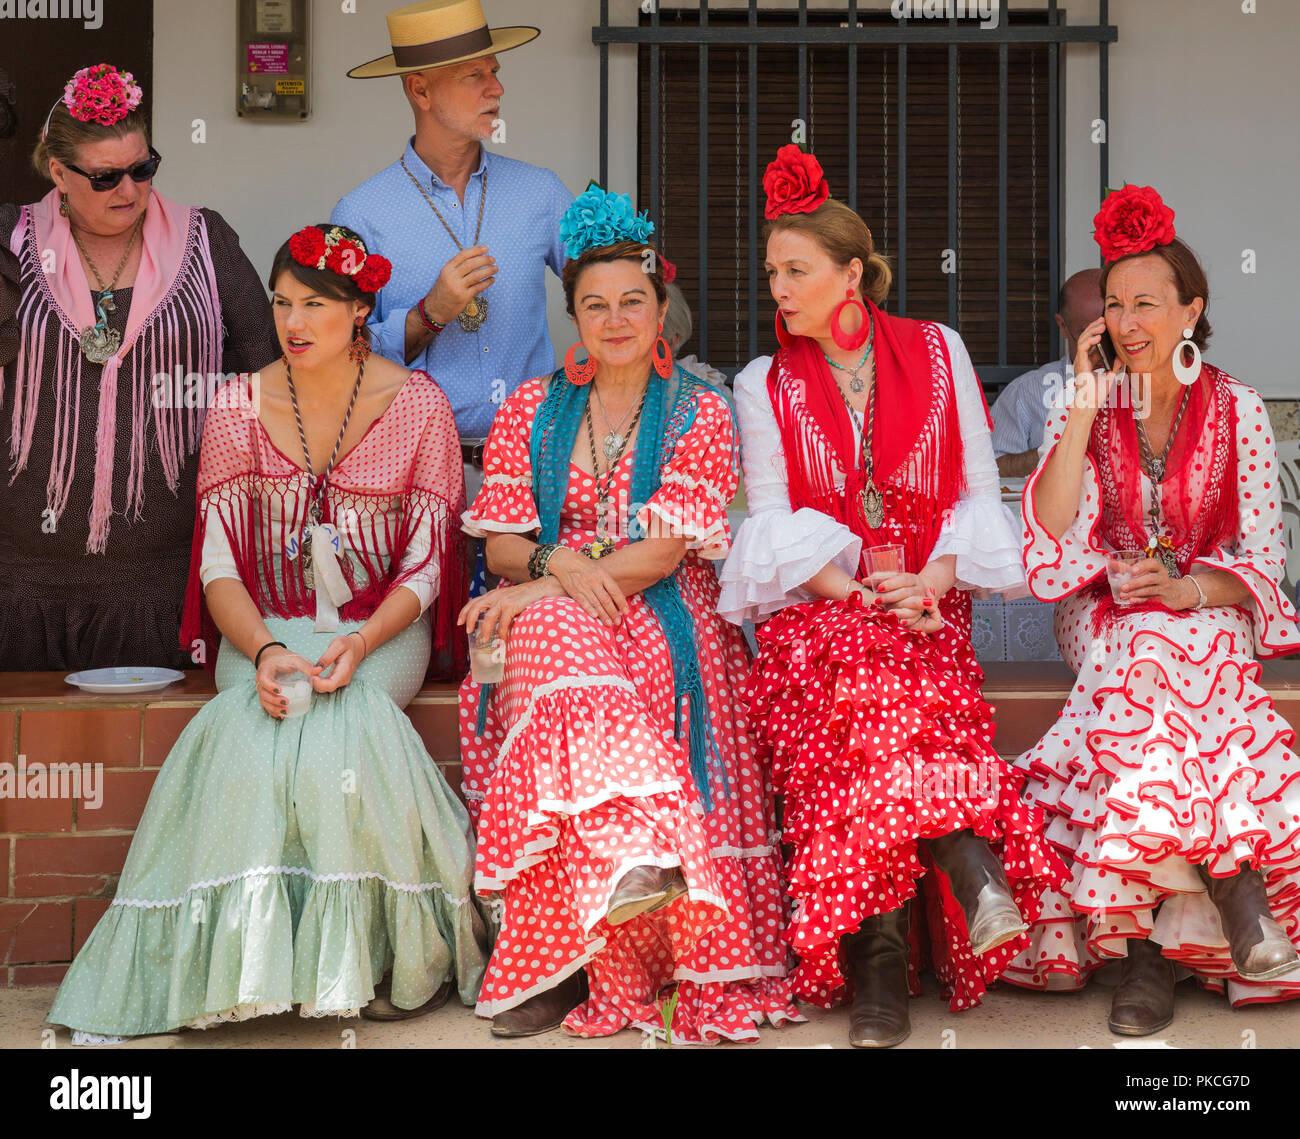 Women wearing colourful gypsy dresses, Pentecost pilgrimage of El Rocio, Huelva province, Andalusia, Spain - Stock Image